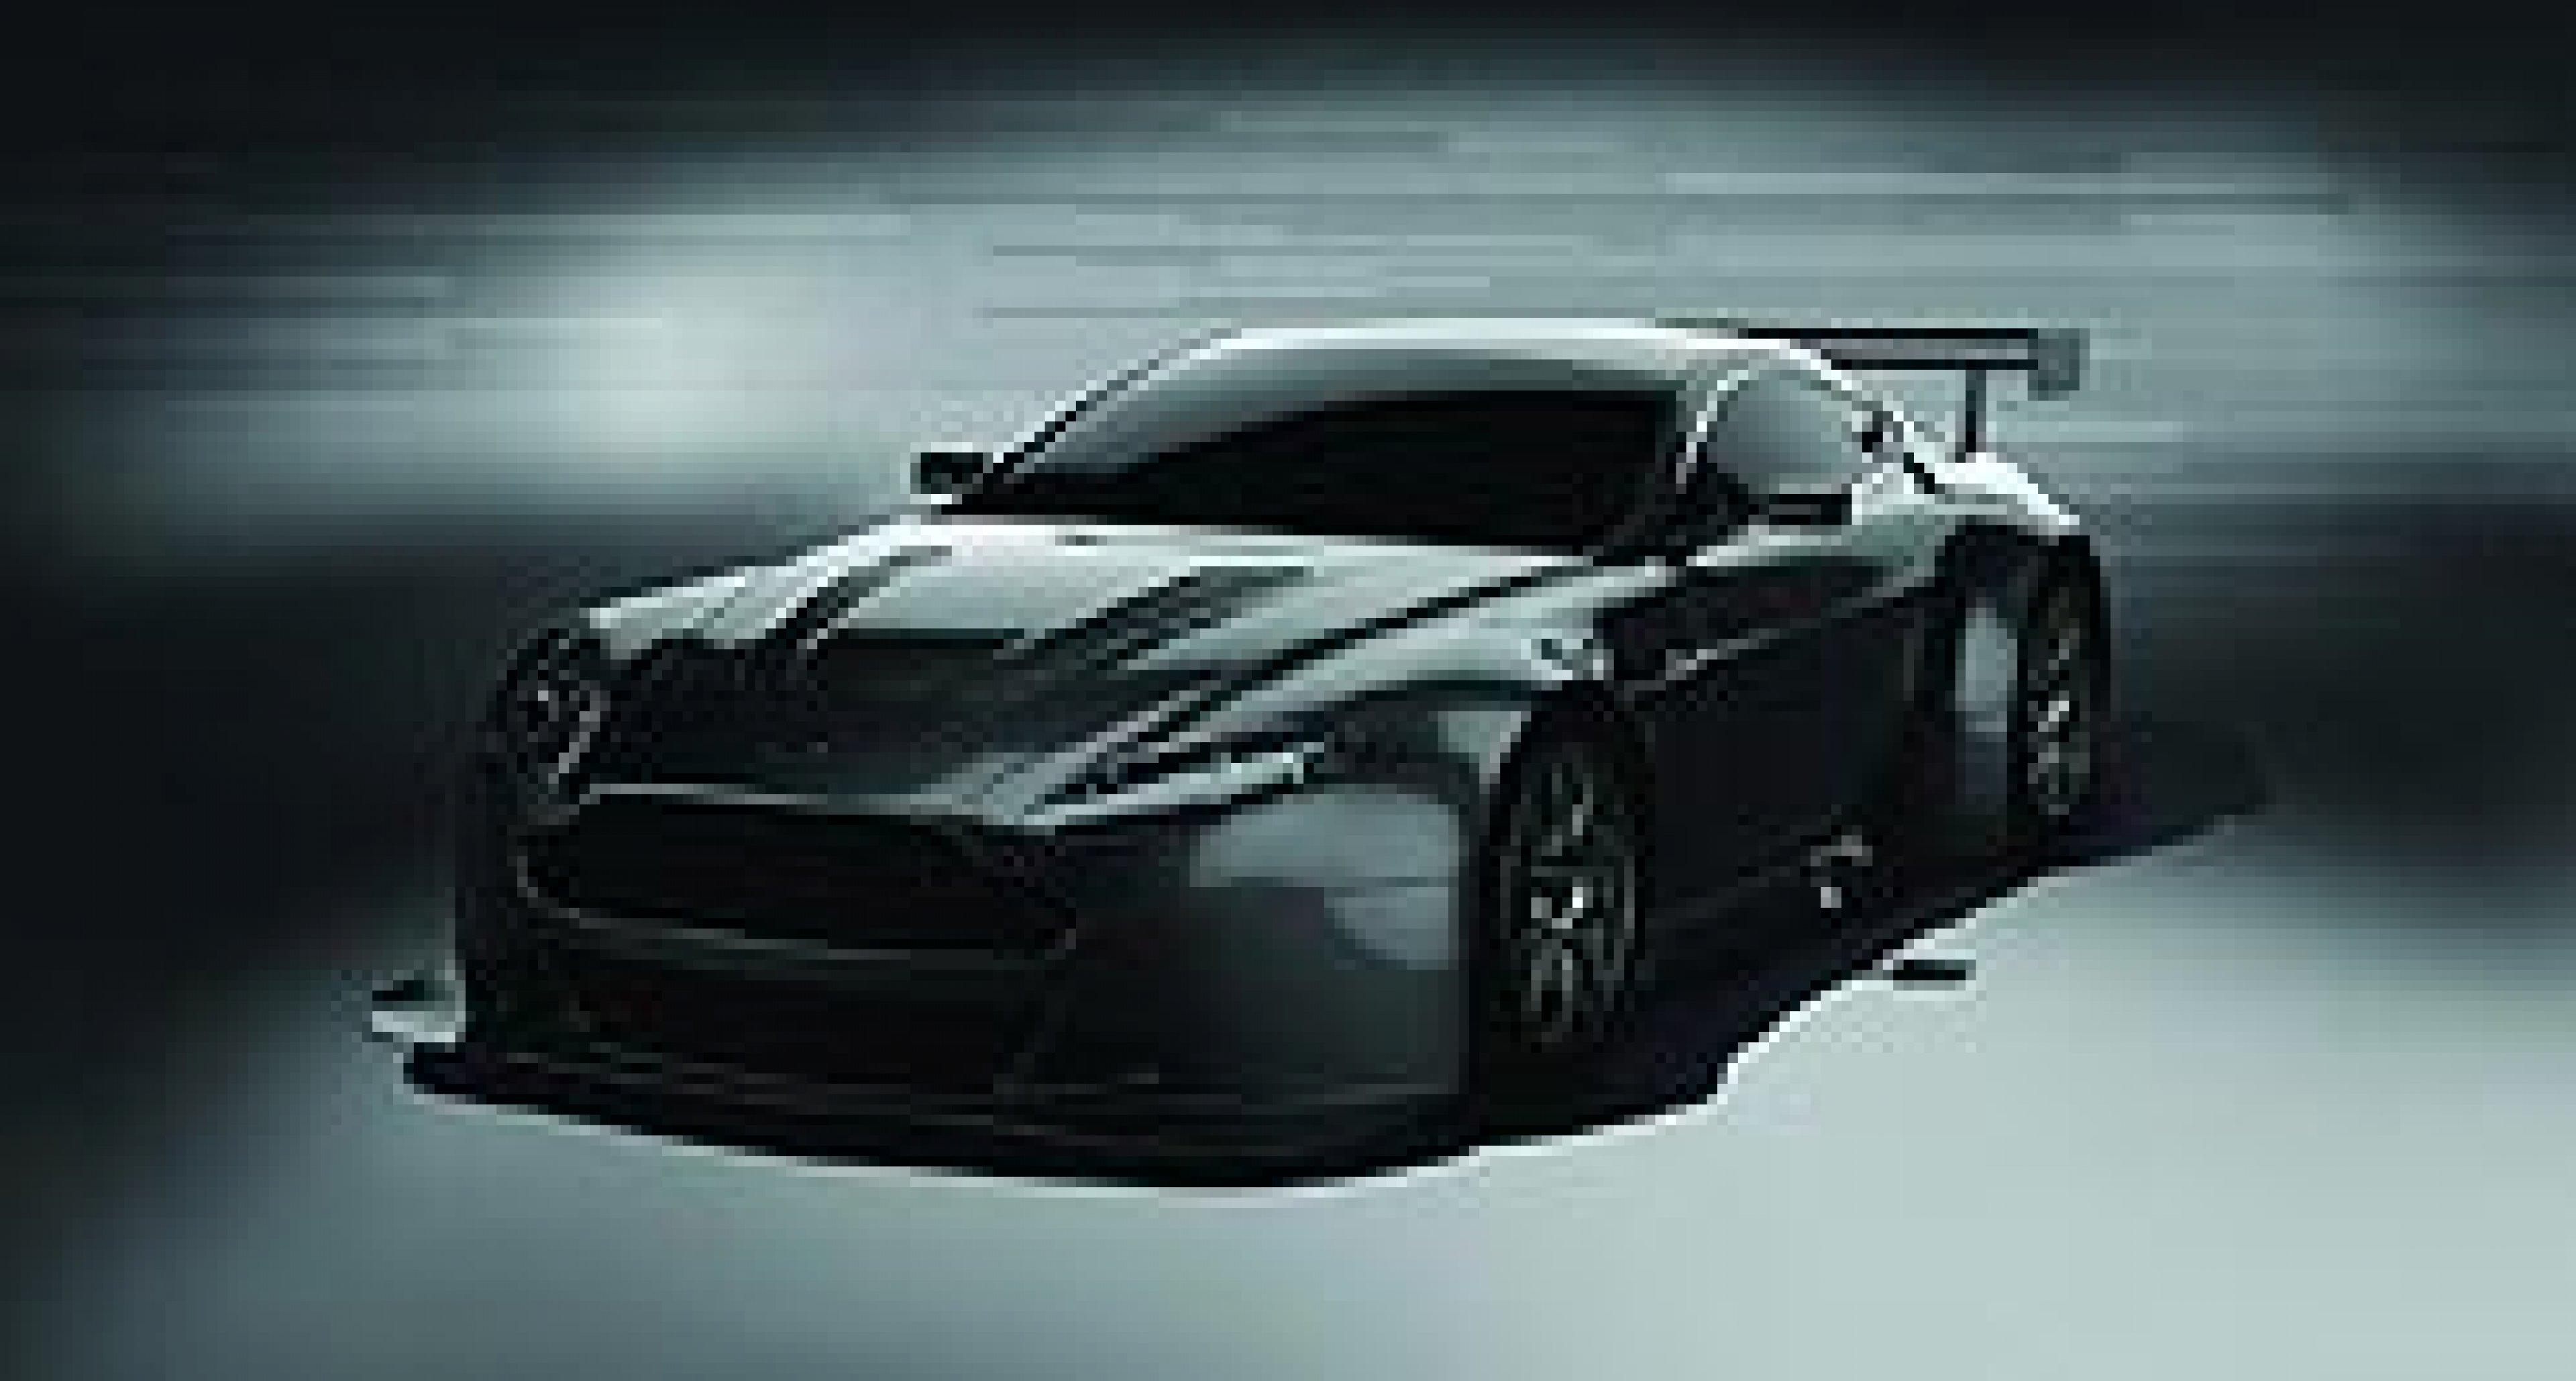 Aston Martin Introduces V12 Vantage GT3 Contender for 2012 Season